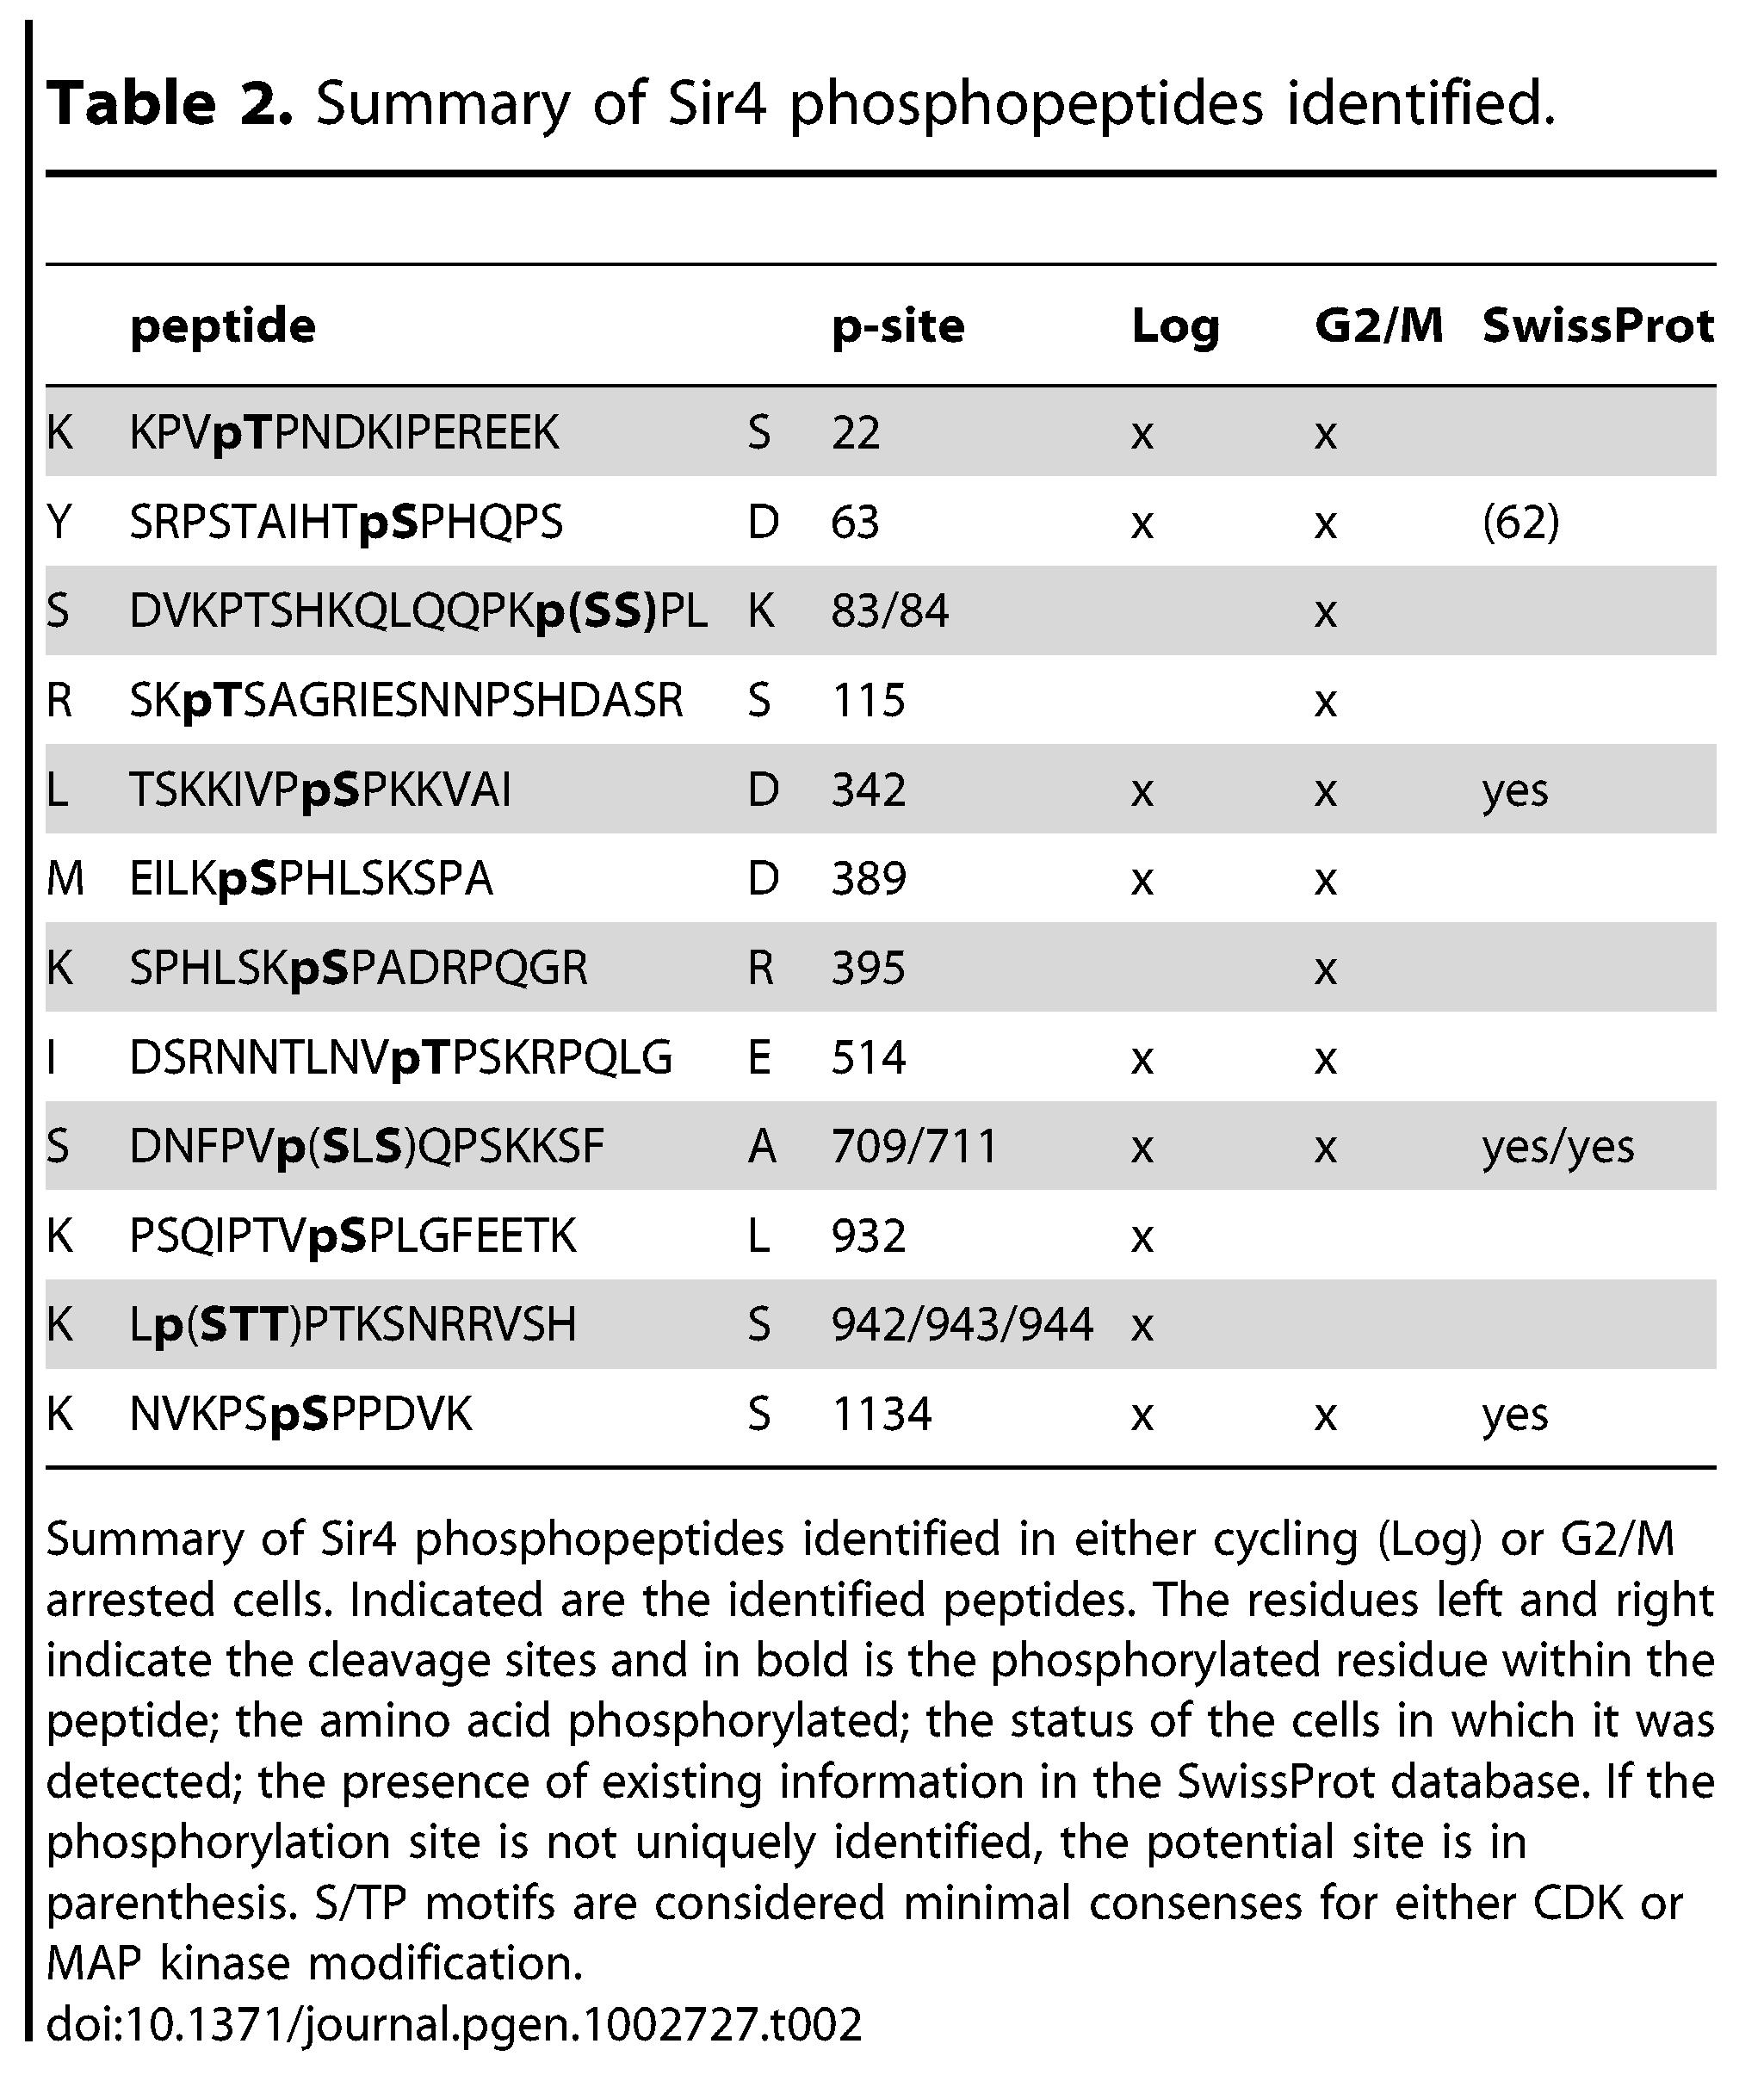 Summary of Sir4 phosphopeptides identified.